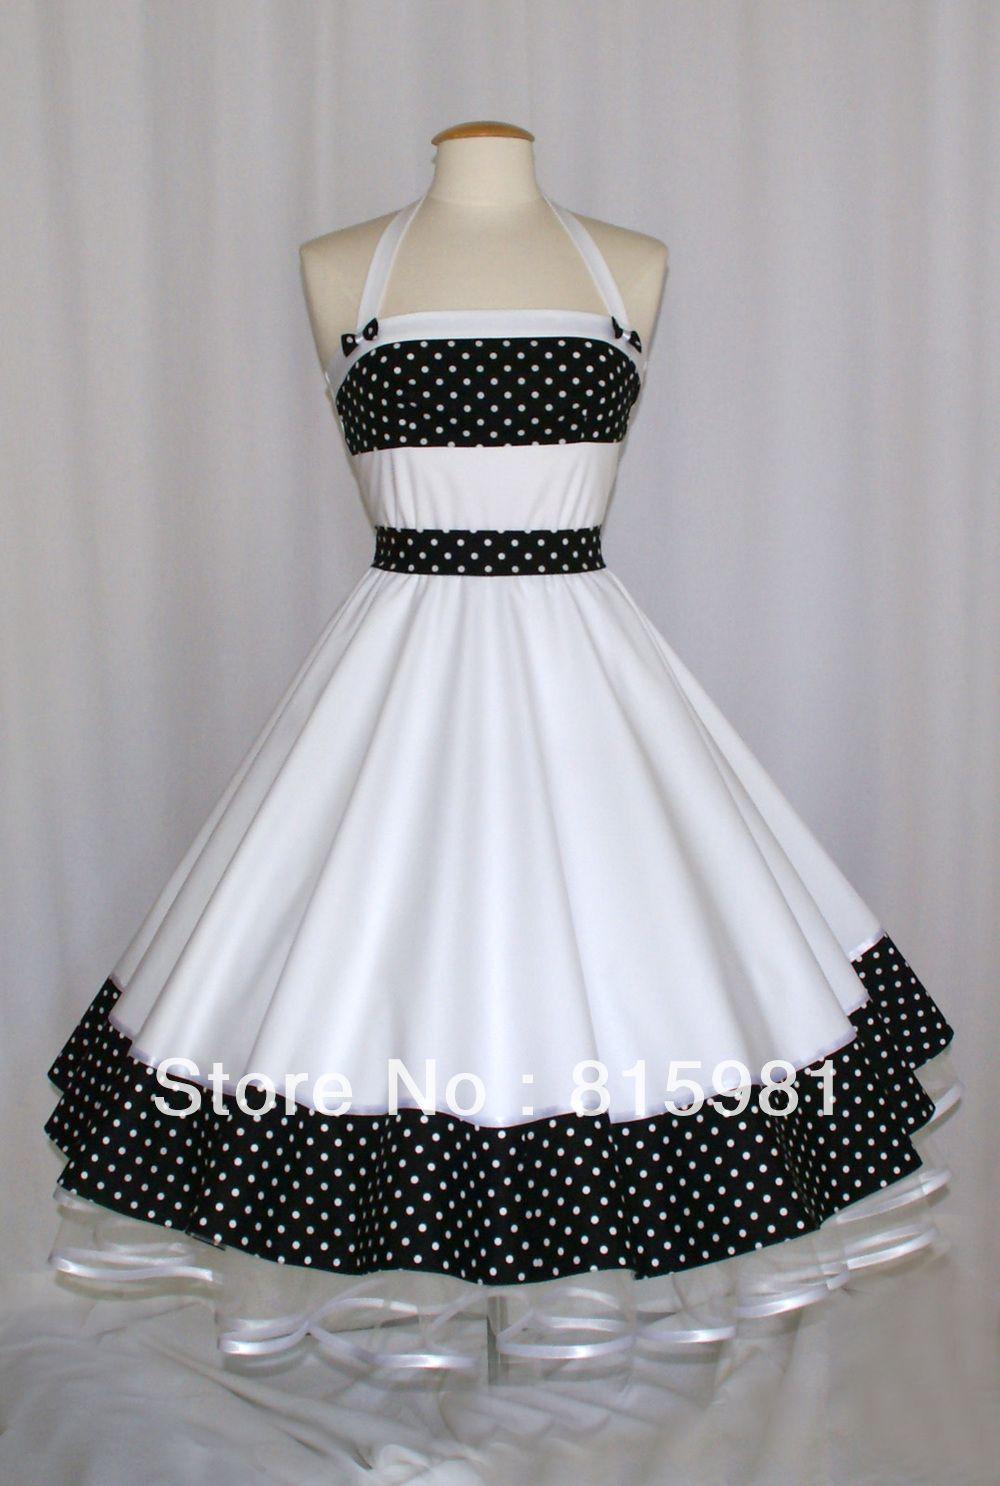 White with Polka Dot Petticoat Rockabilly Swing Dress 50\'s Girls ...